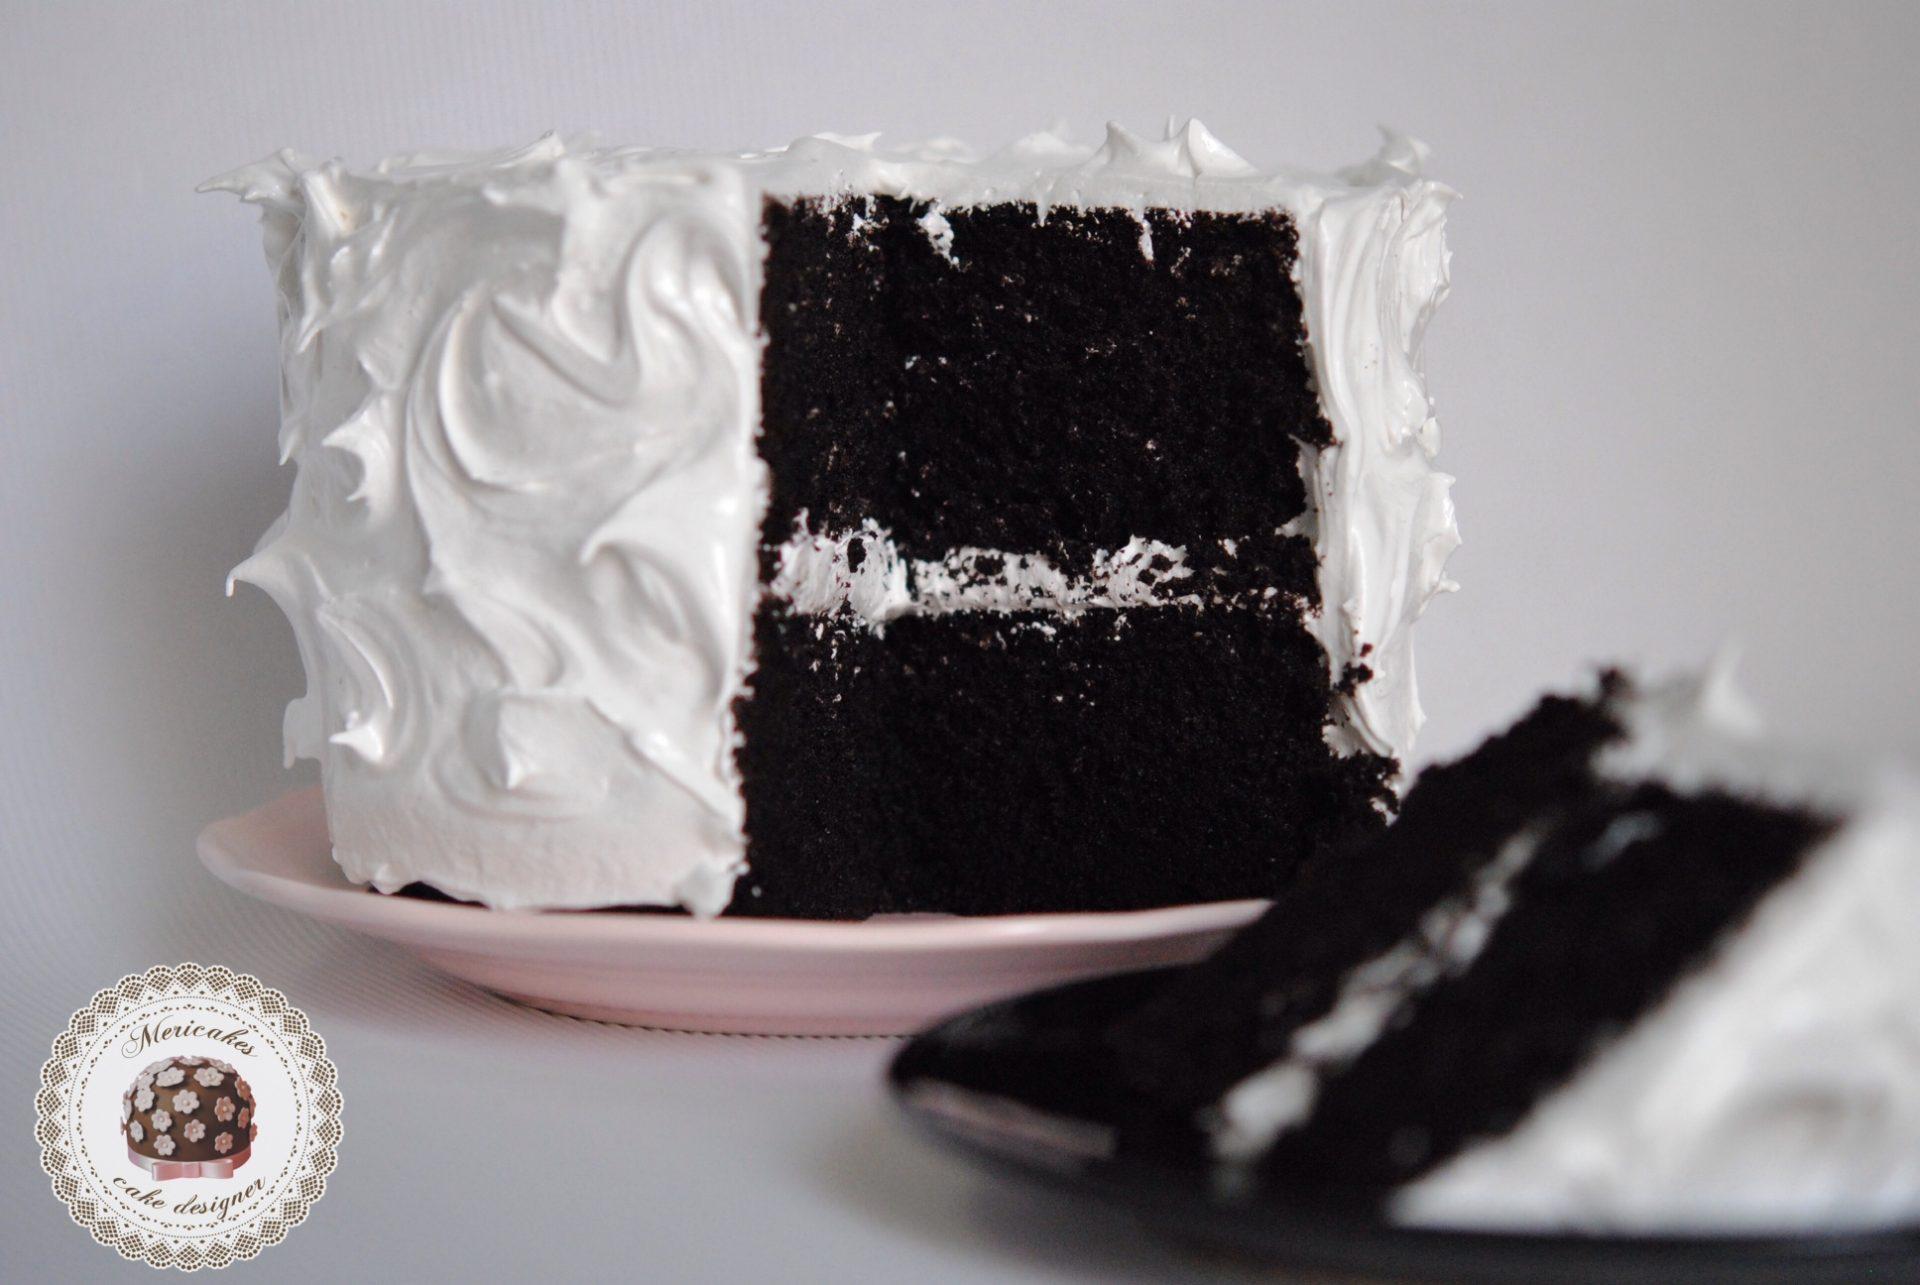 curso-devils-food-cacao-tarta-layer-cake-mericakes-barcelona-escuela-reposteria-merengue-pasteleria